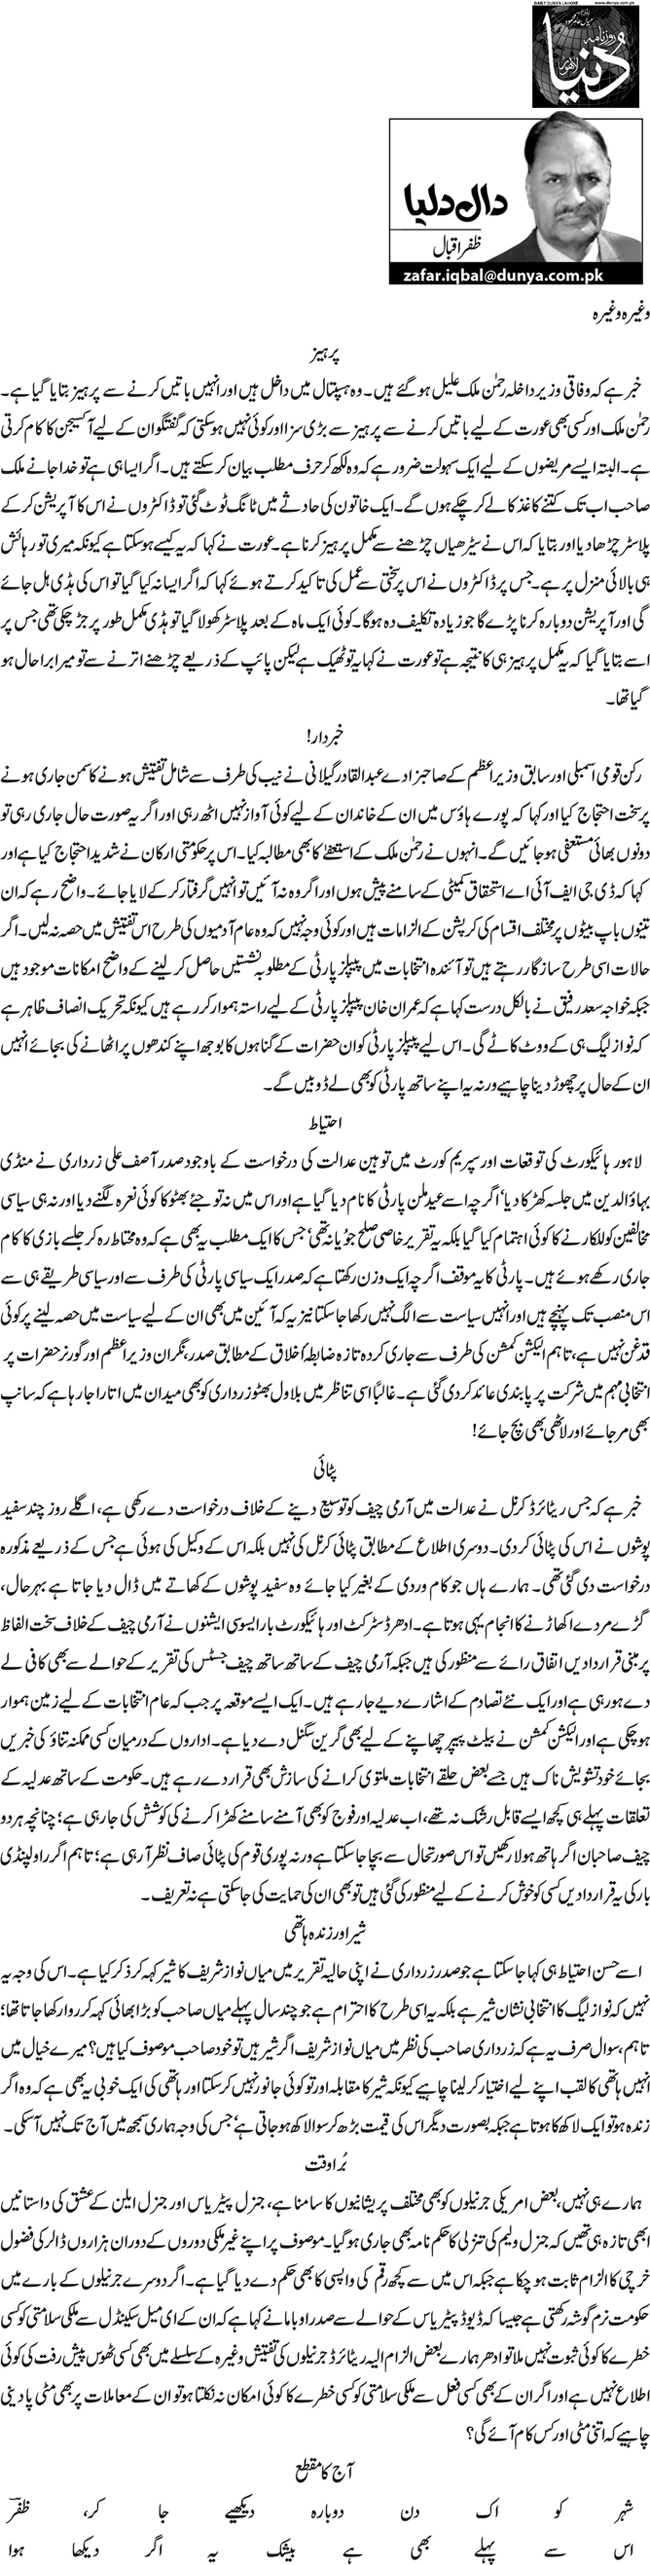 Waghaira waghaira - Zafar Iqbal